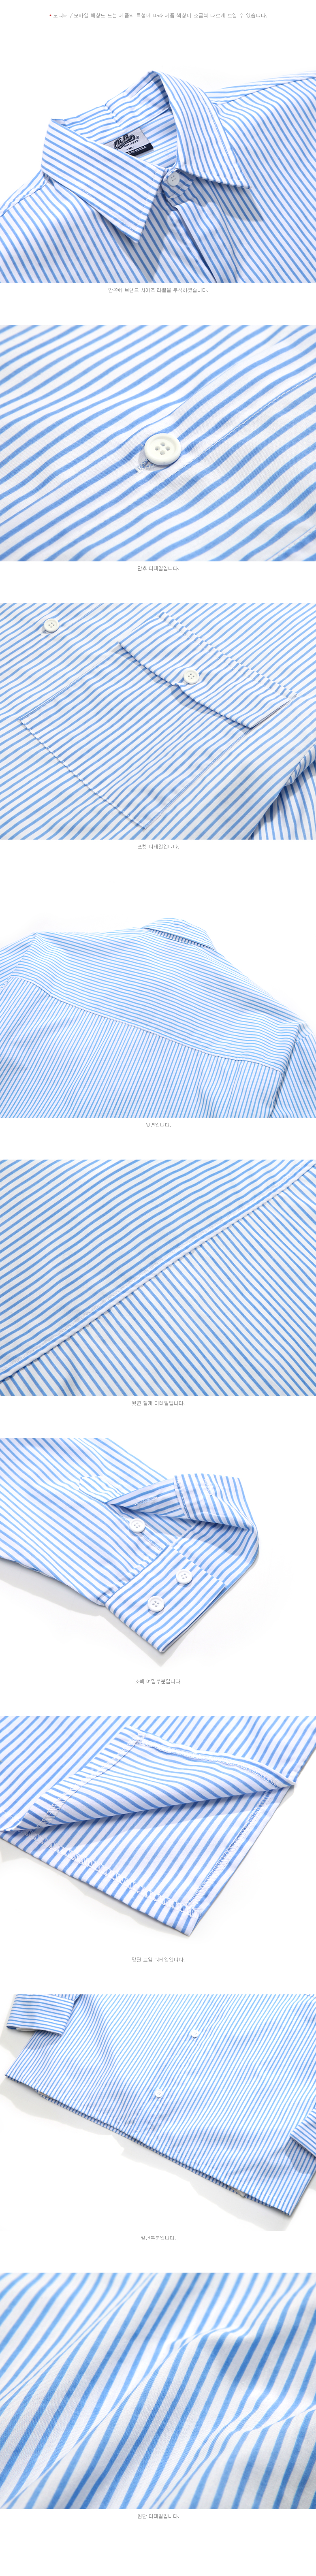 KHLS6163_detail_skyblue_02_free.jpg